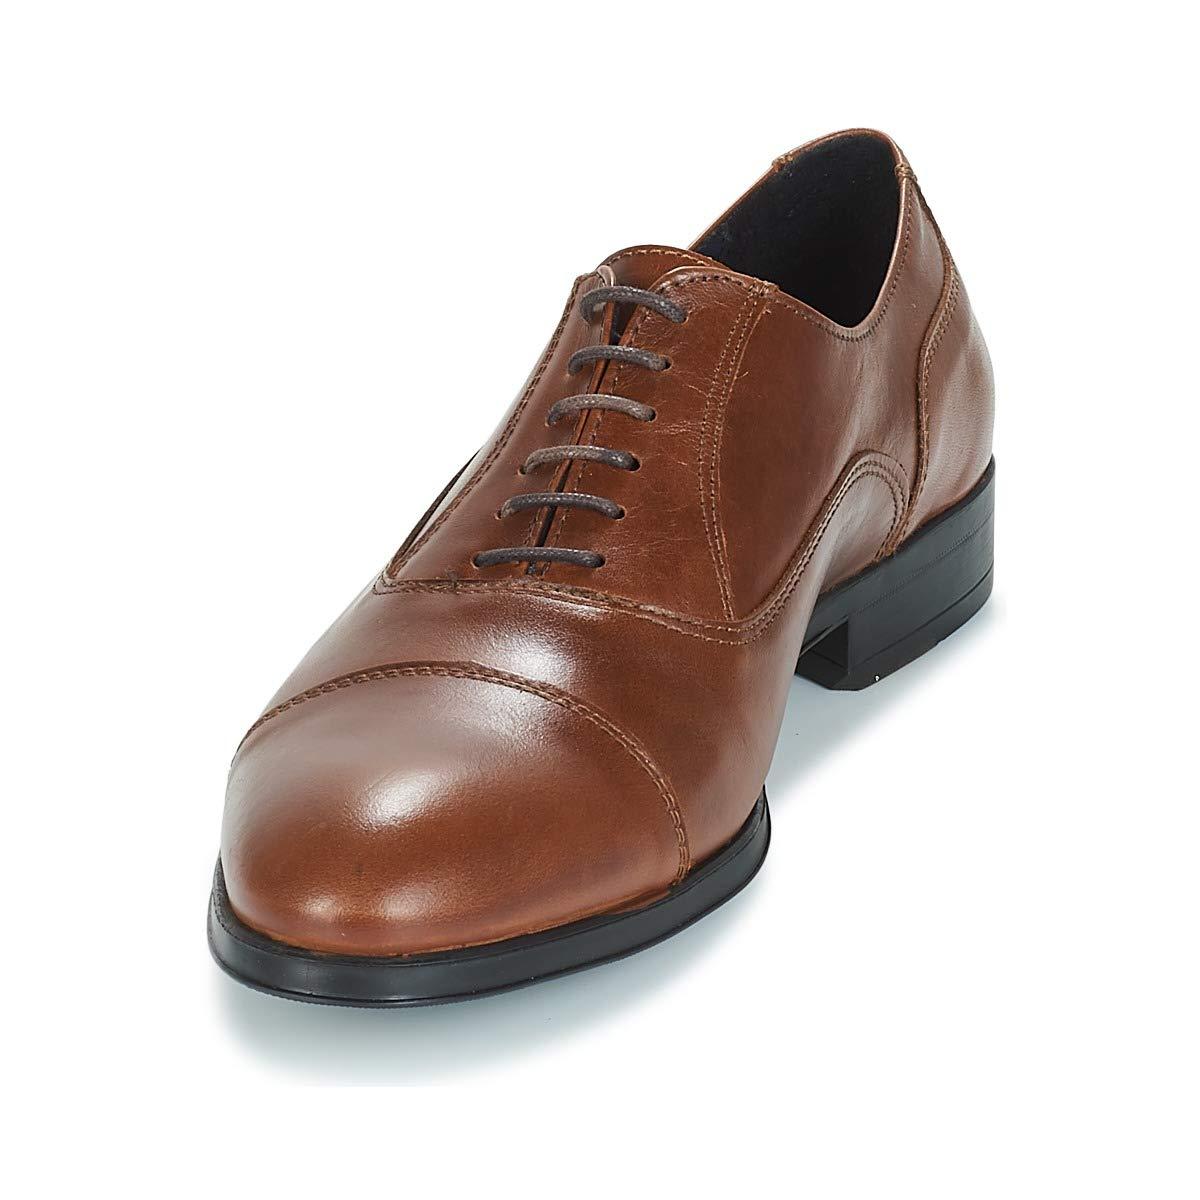 Carlington JOULIA Derby-Schuhe Derby-Schuhe Derby-Schuhe & Richelieu Herren Braun Richelieu faa7ab